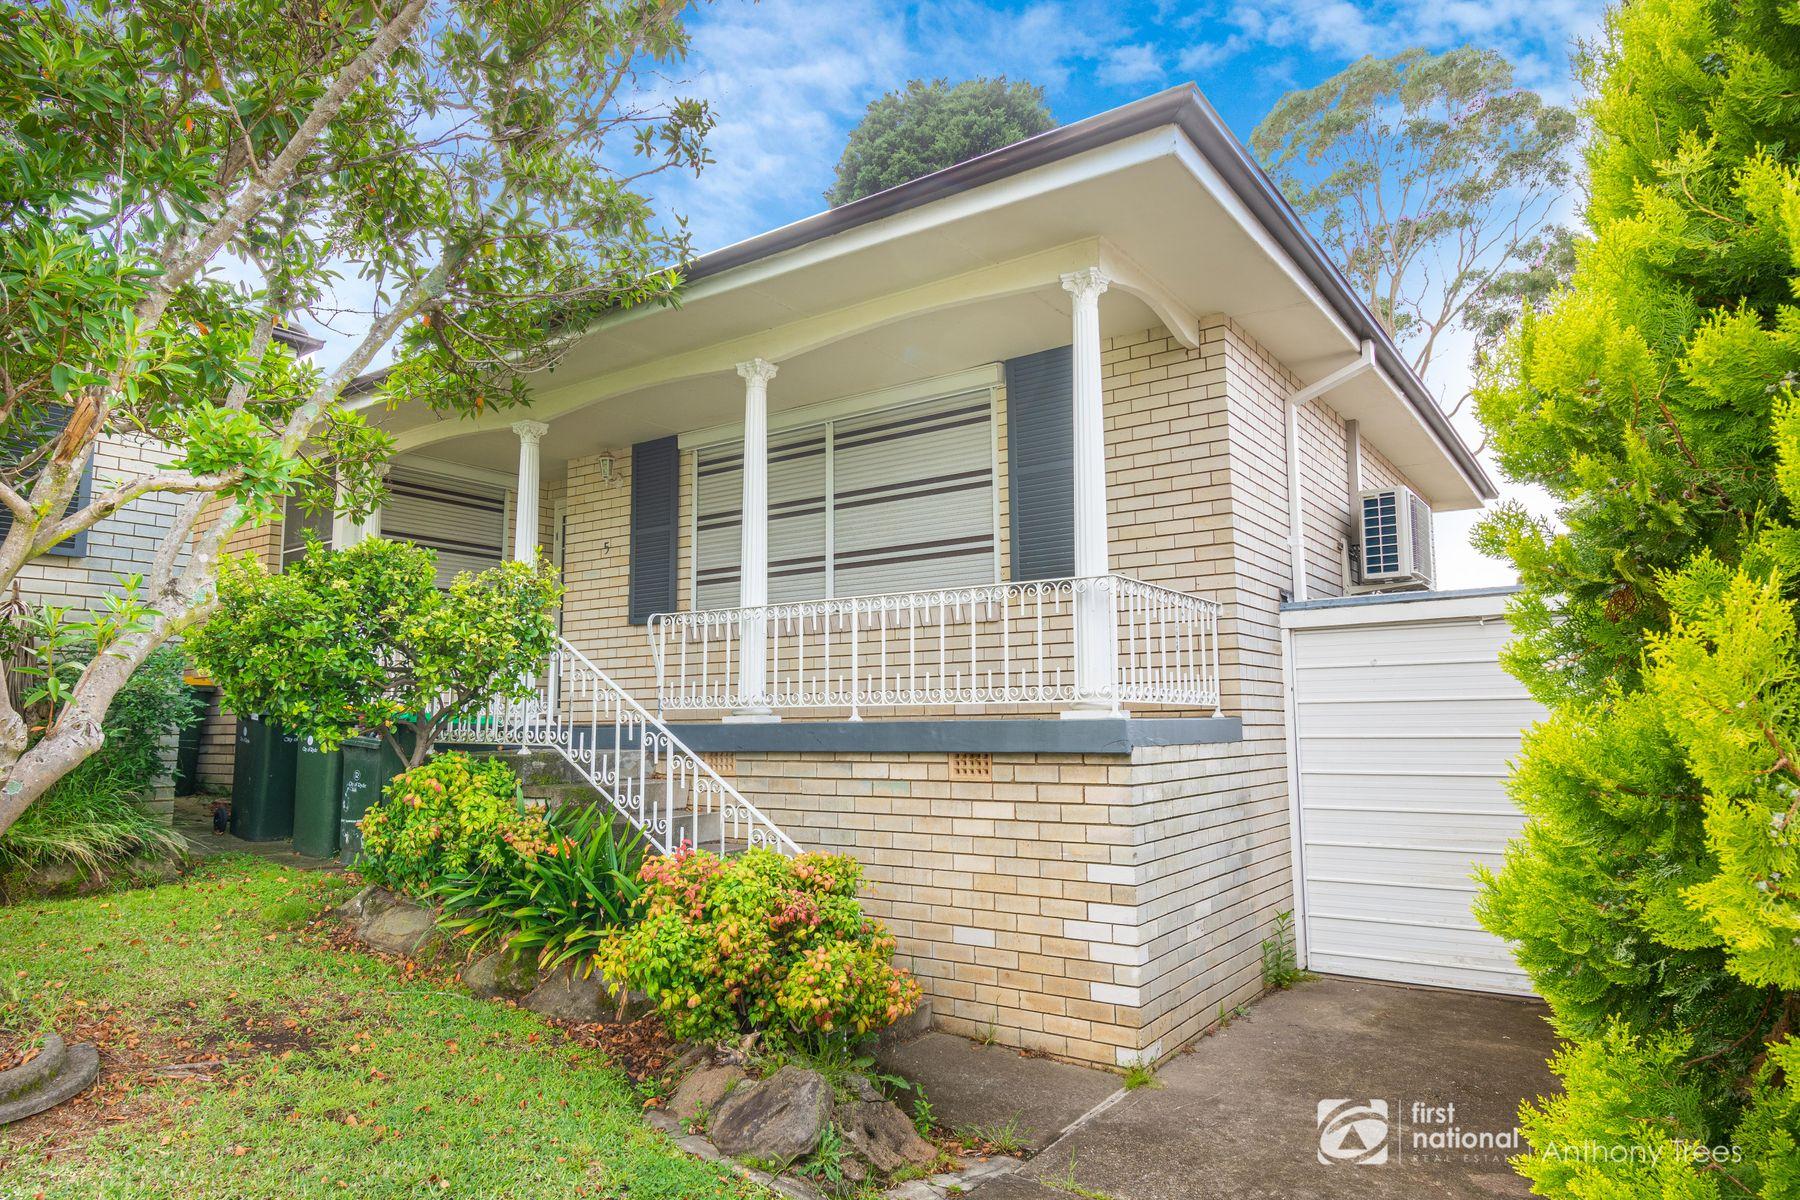 5/4-6 Denistone Road, Eastwood, NSW 2122